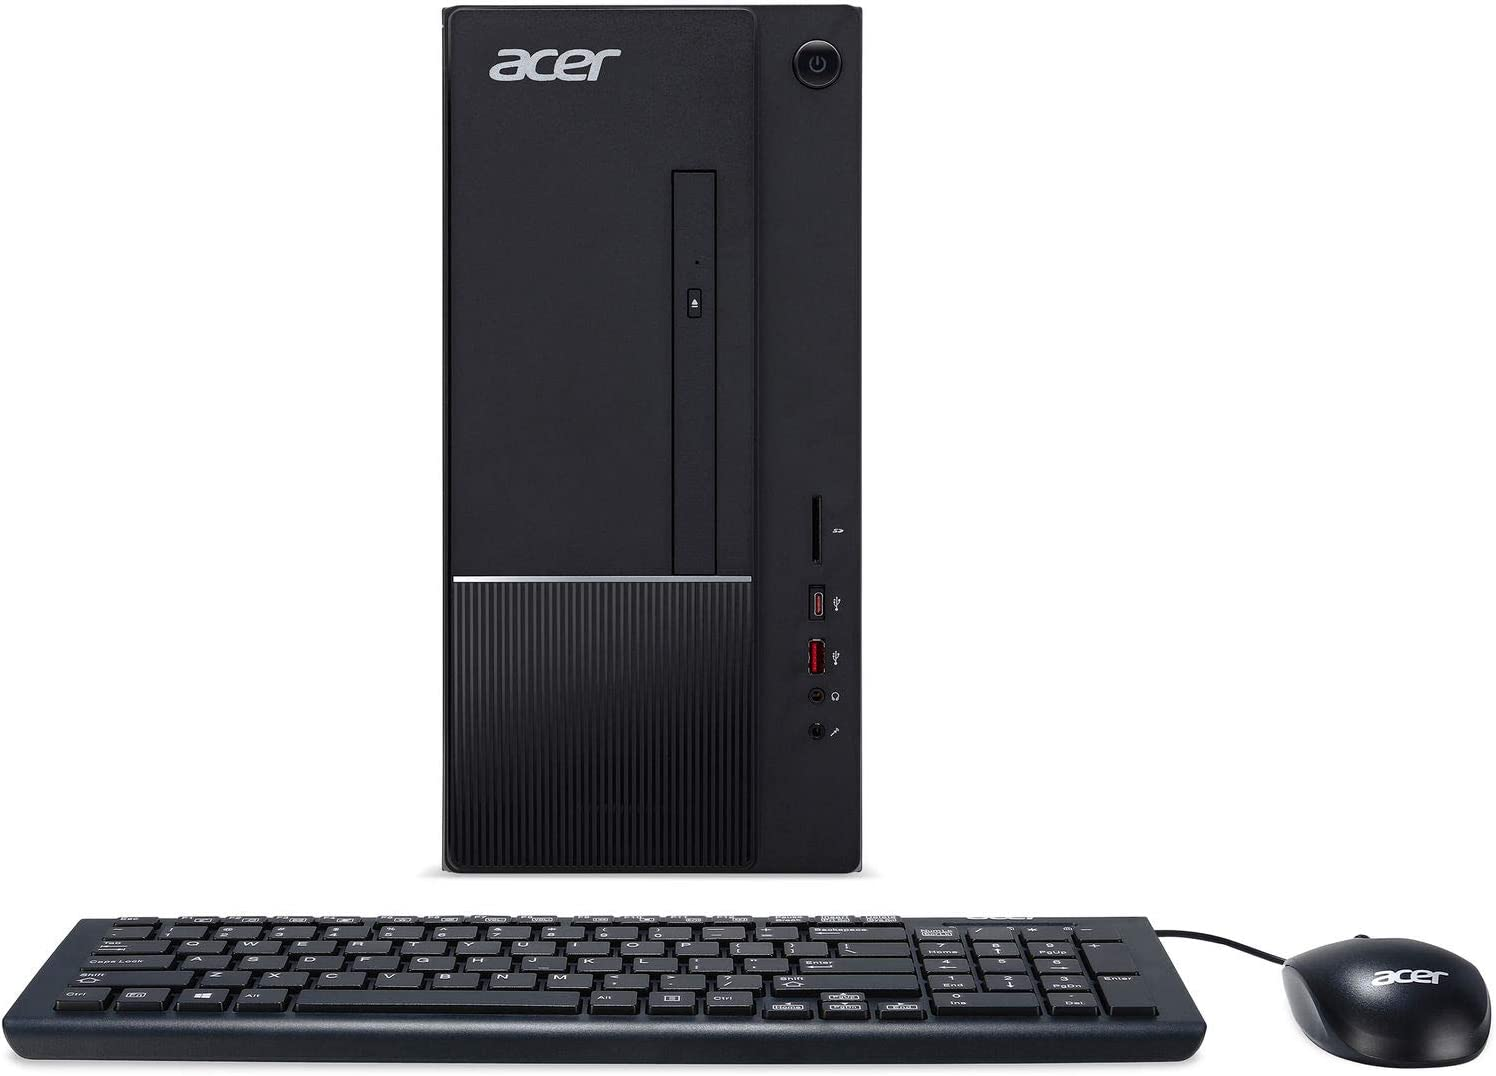 Acer Aspire TC Intel Core i5-9400 2.9GHz 8GB Ram 512GB SSD Windows 10 Home (Renewed)